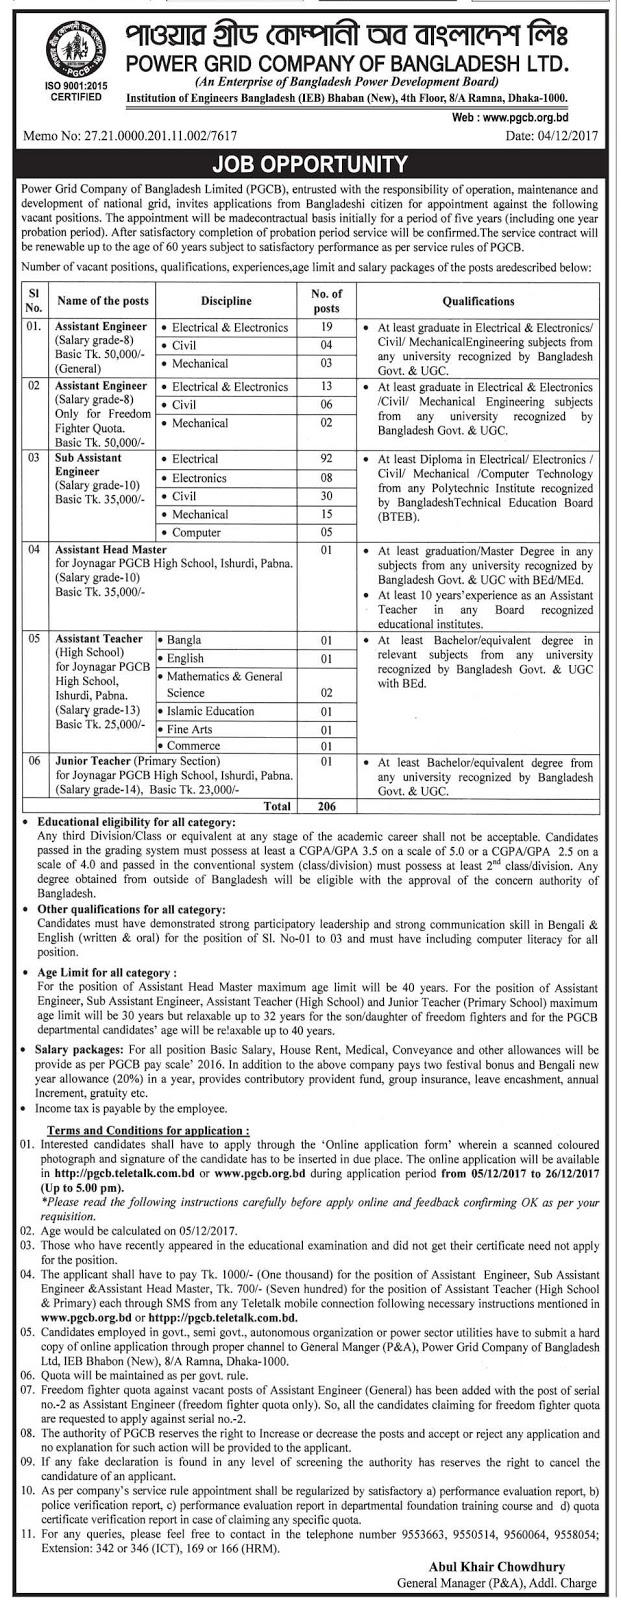 Power Grid Company of Bangladesh (PGCB)